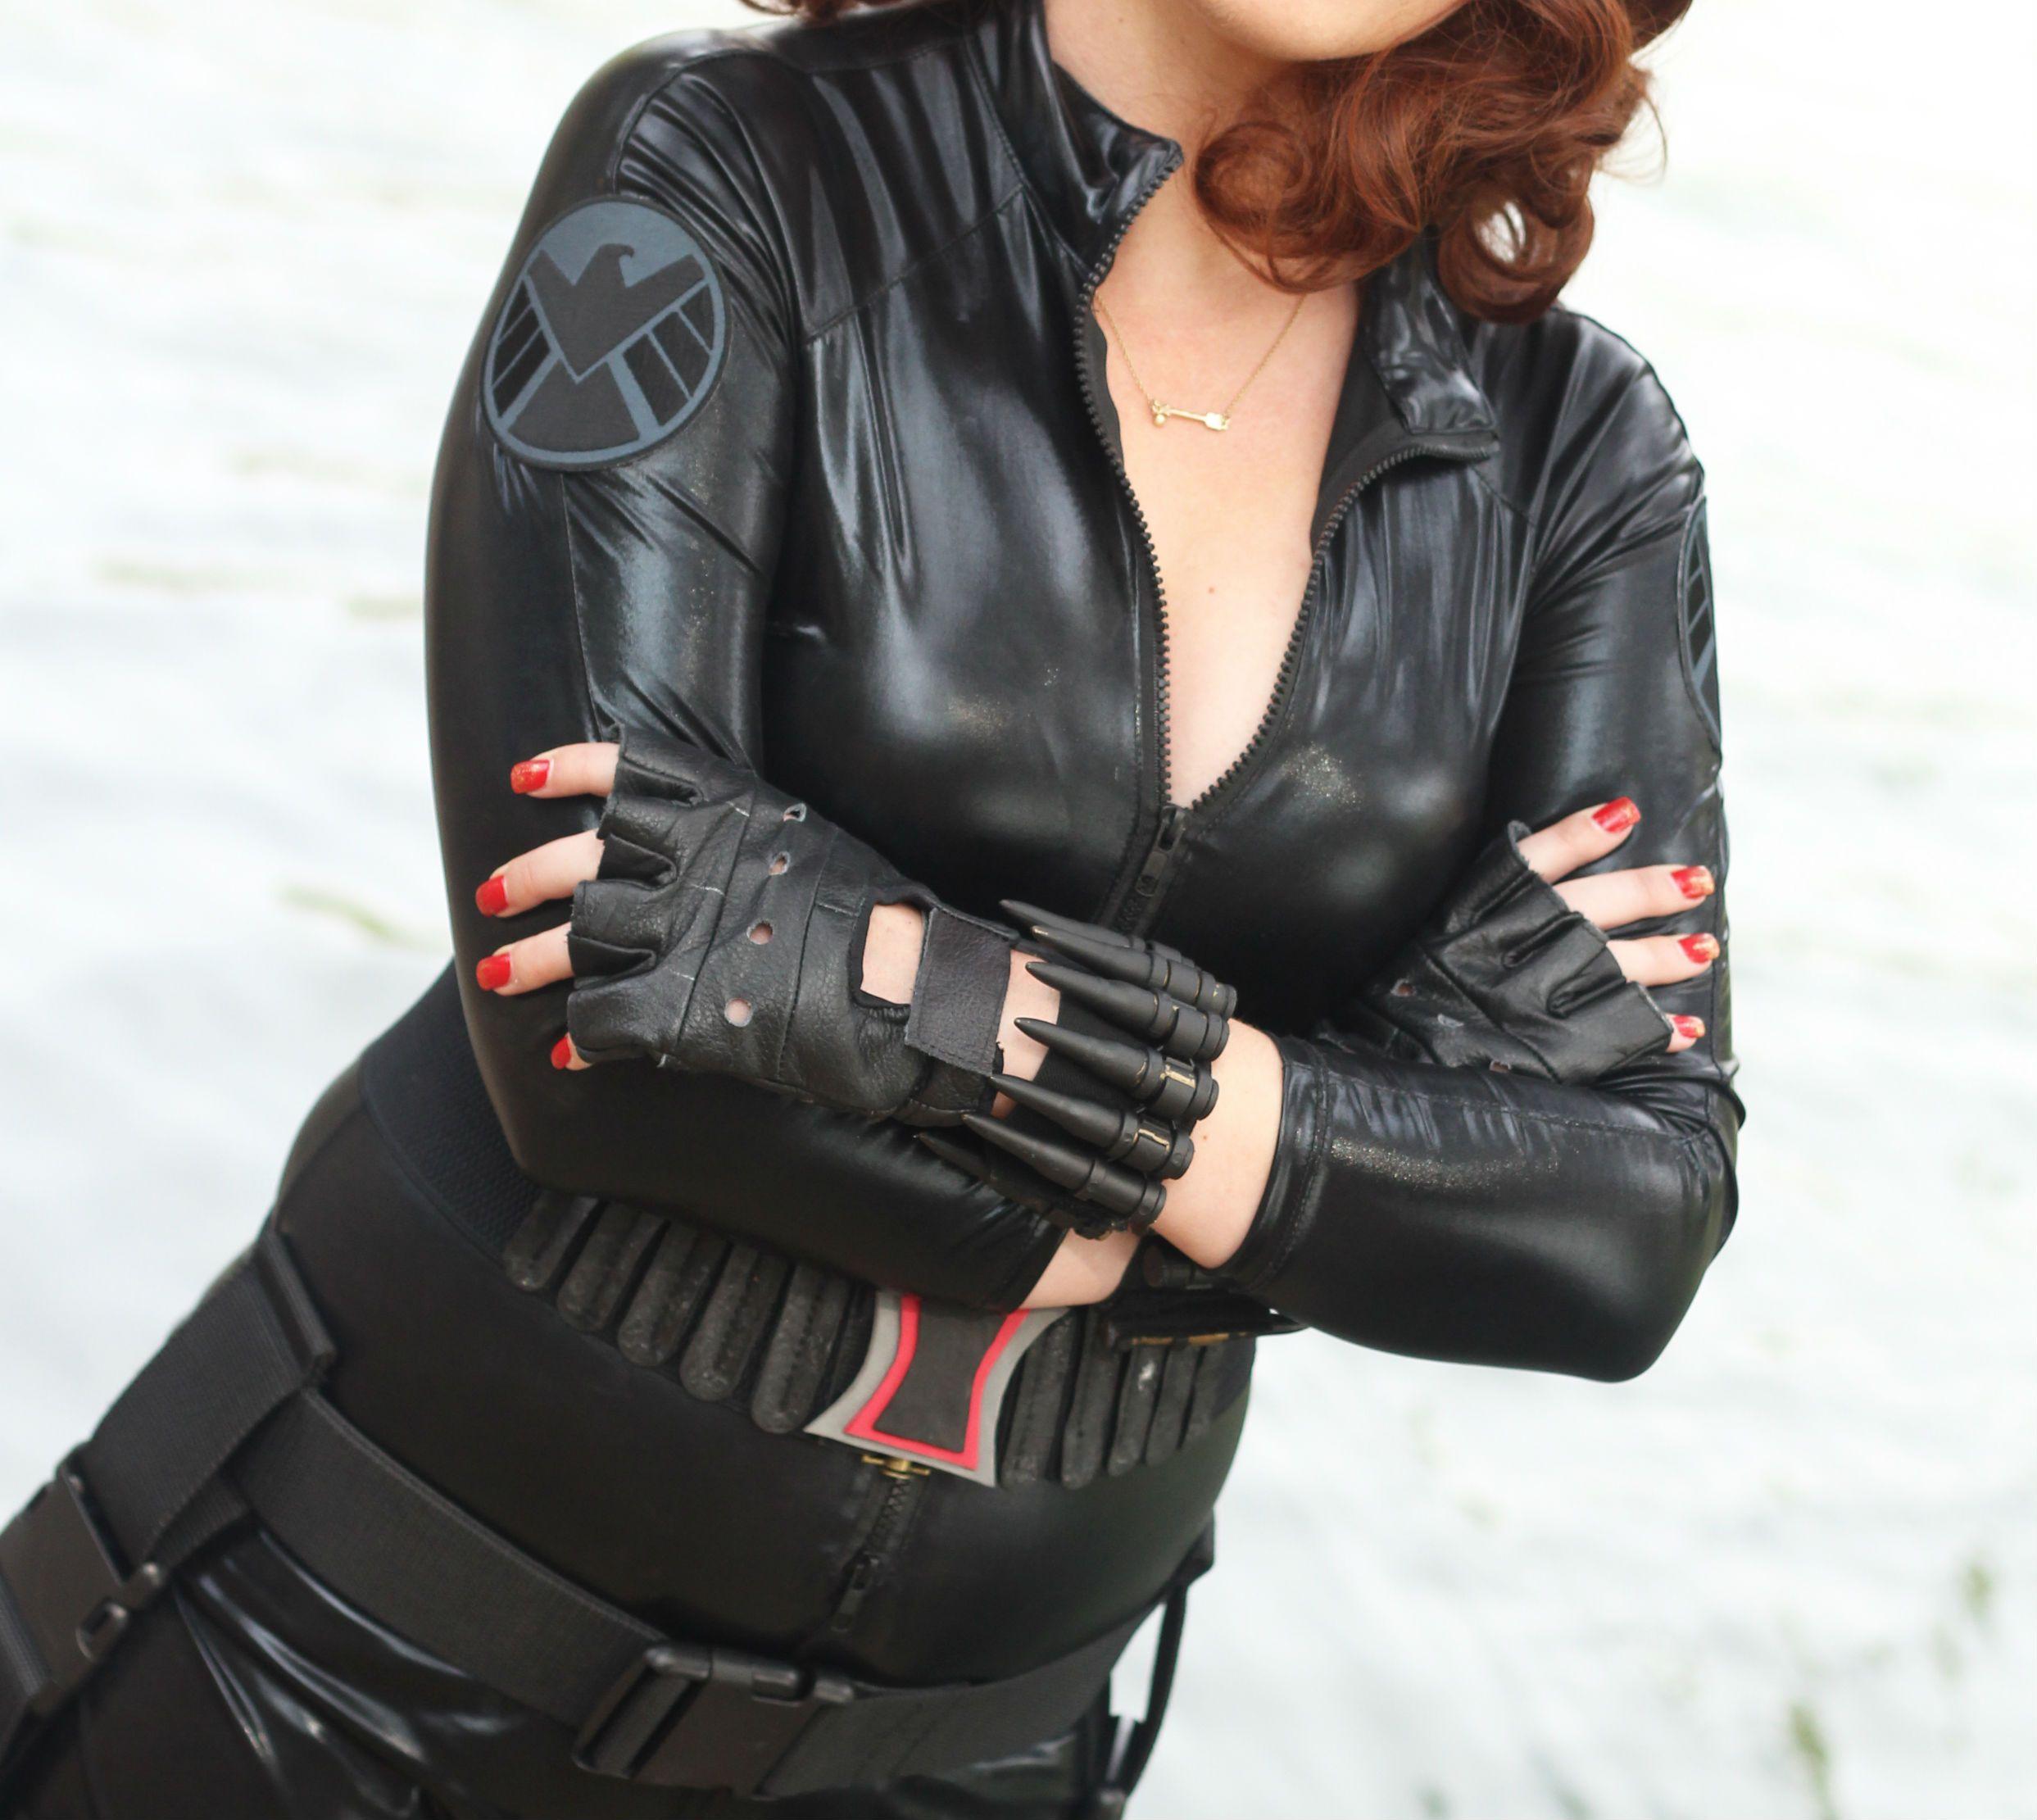 Cosplay howto widows bites black widow costume